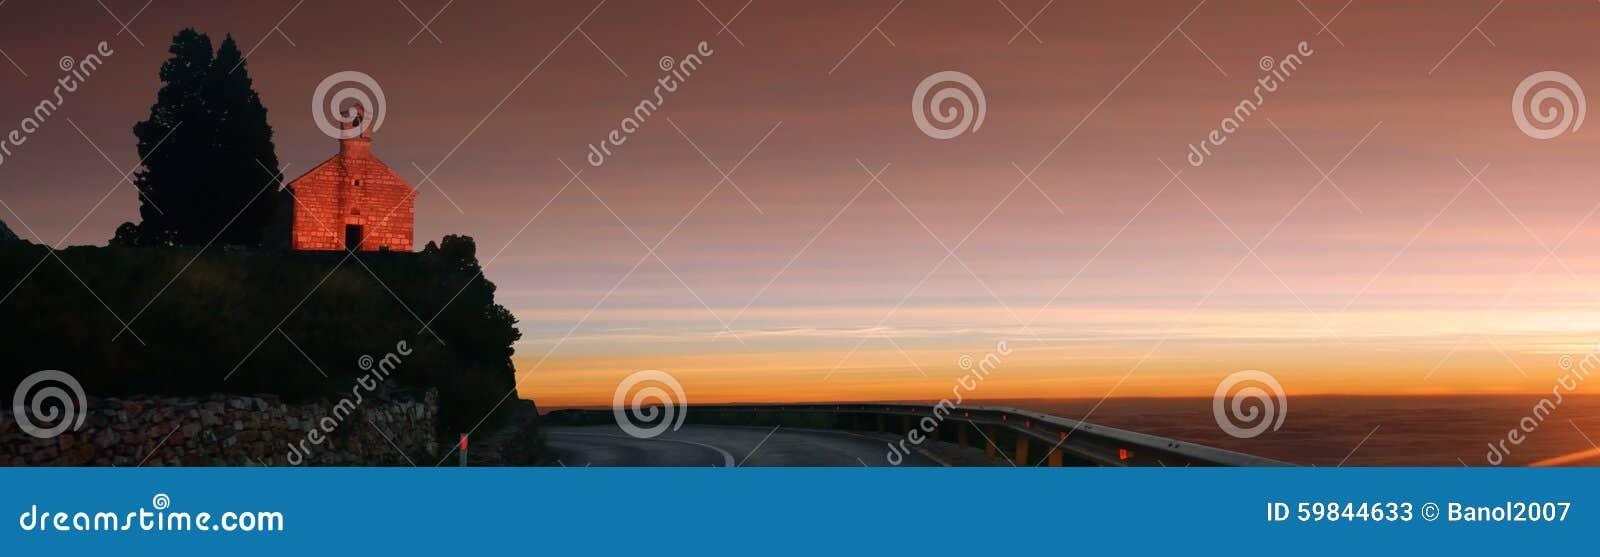 Berg eenzame oude kerk op zonsondergang Panorama